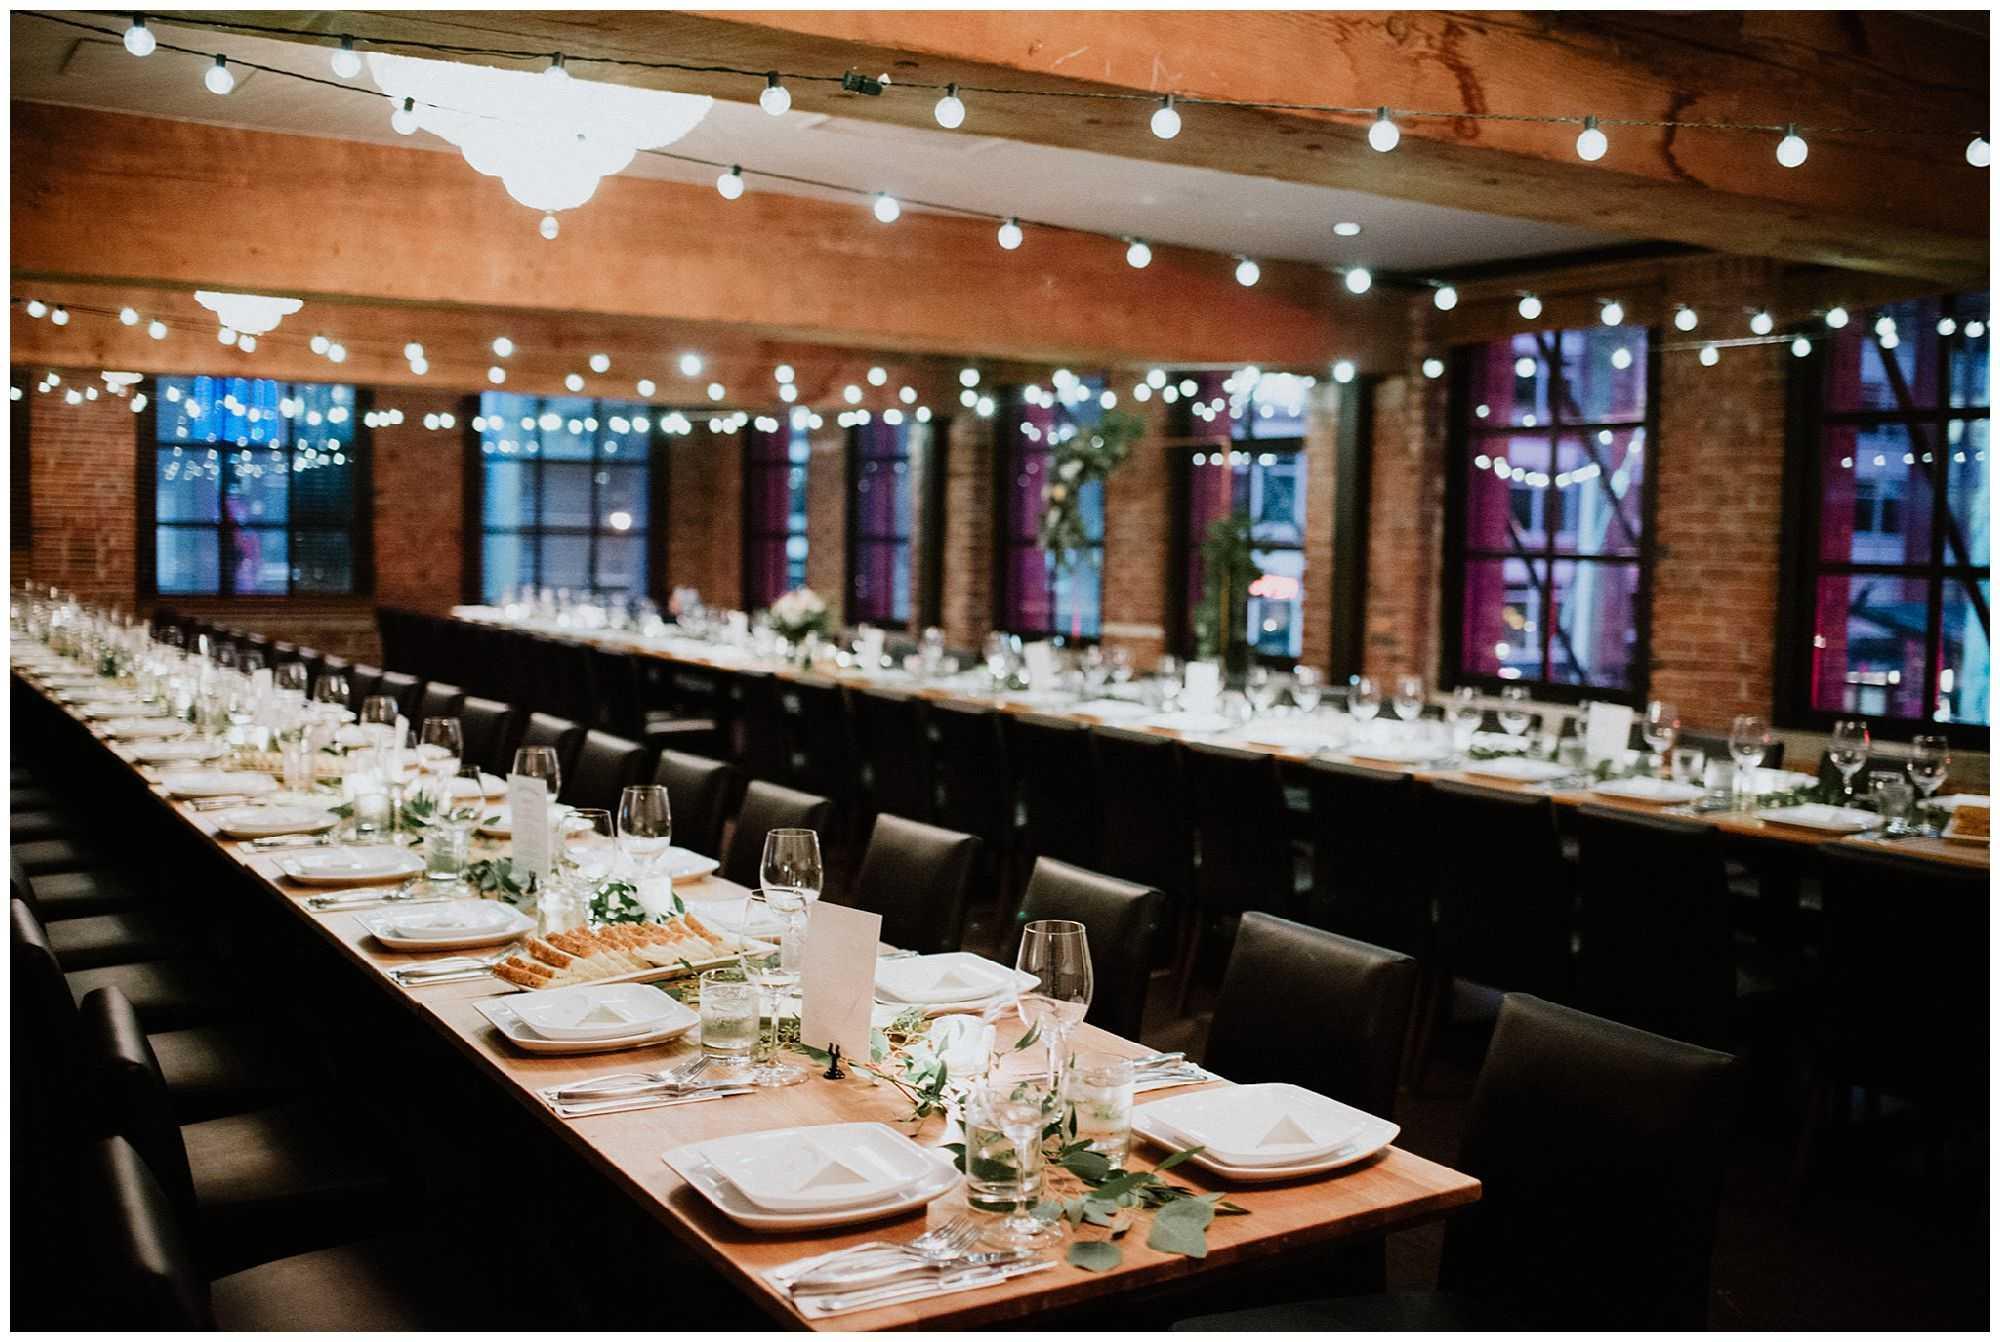 Wedding longtable decor the loft yaletown vancouver